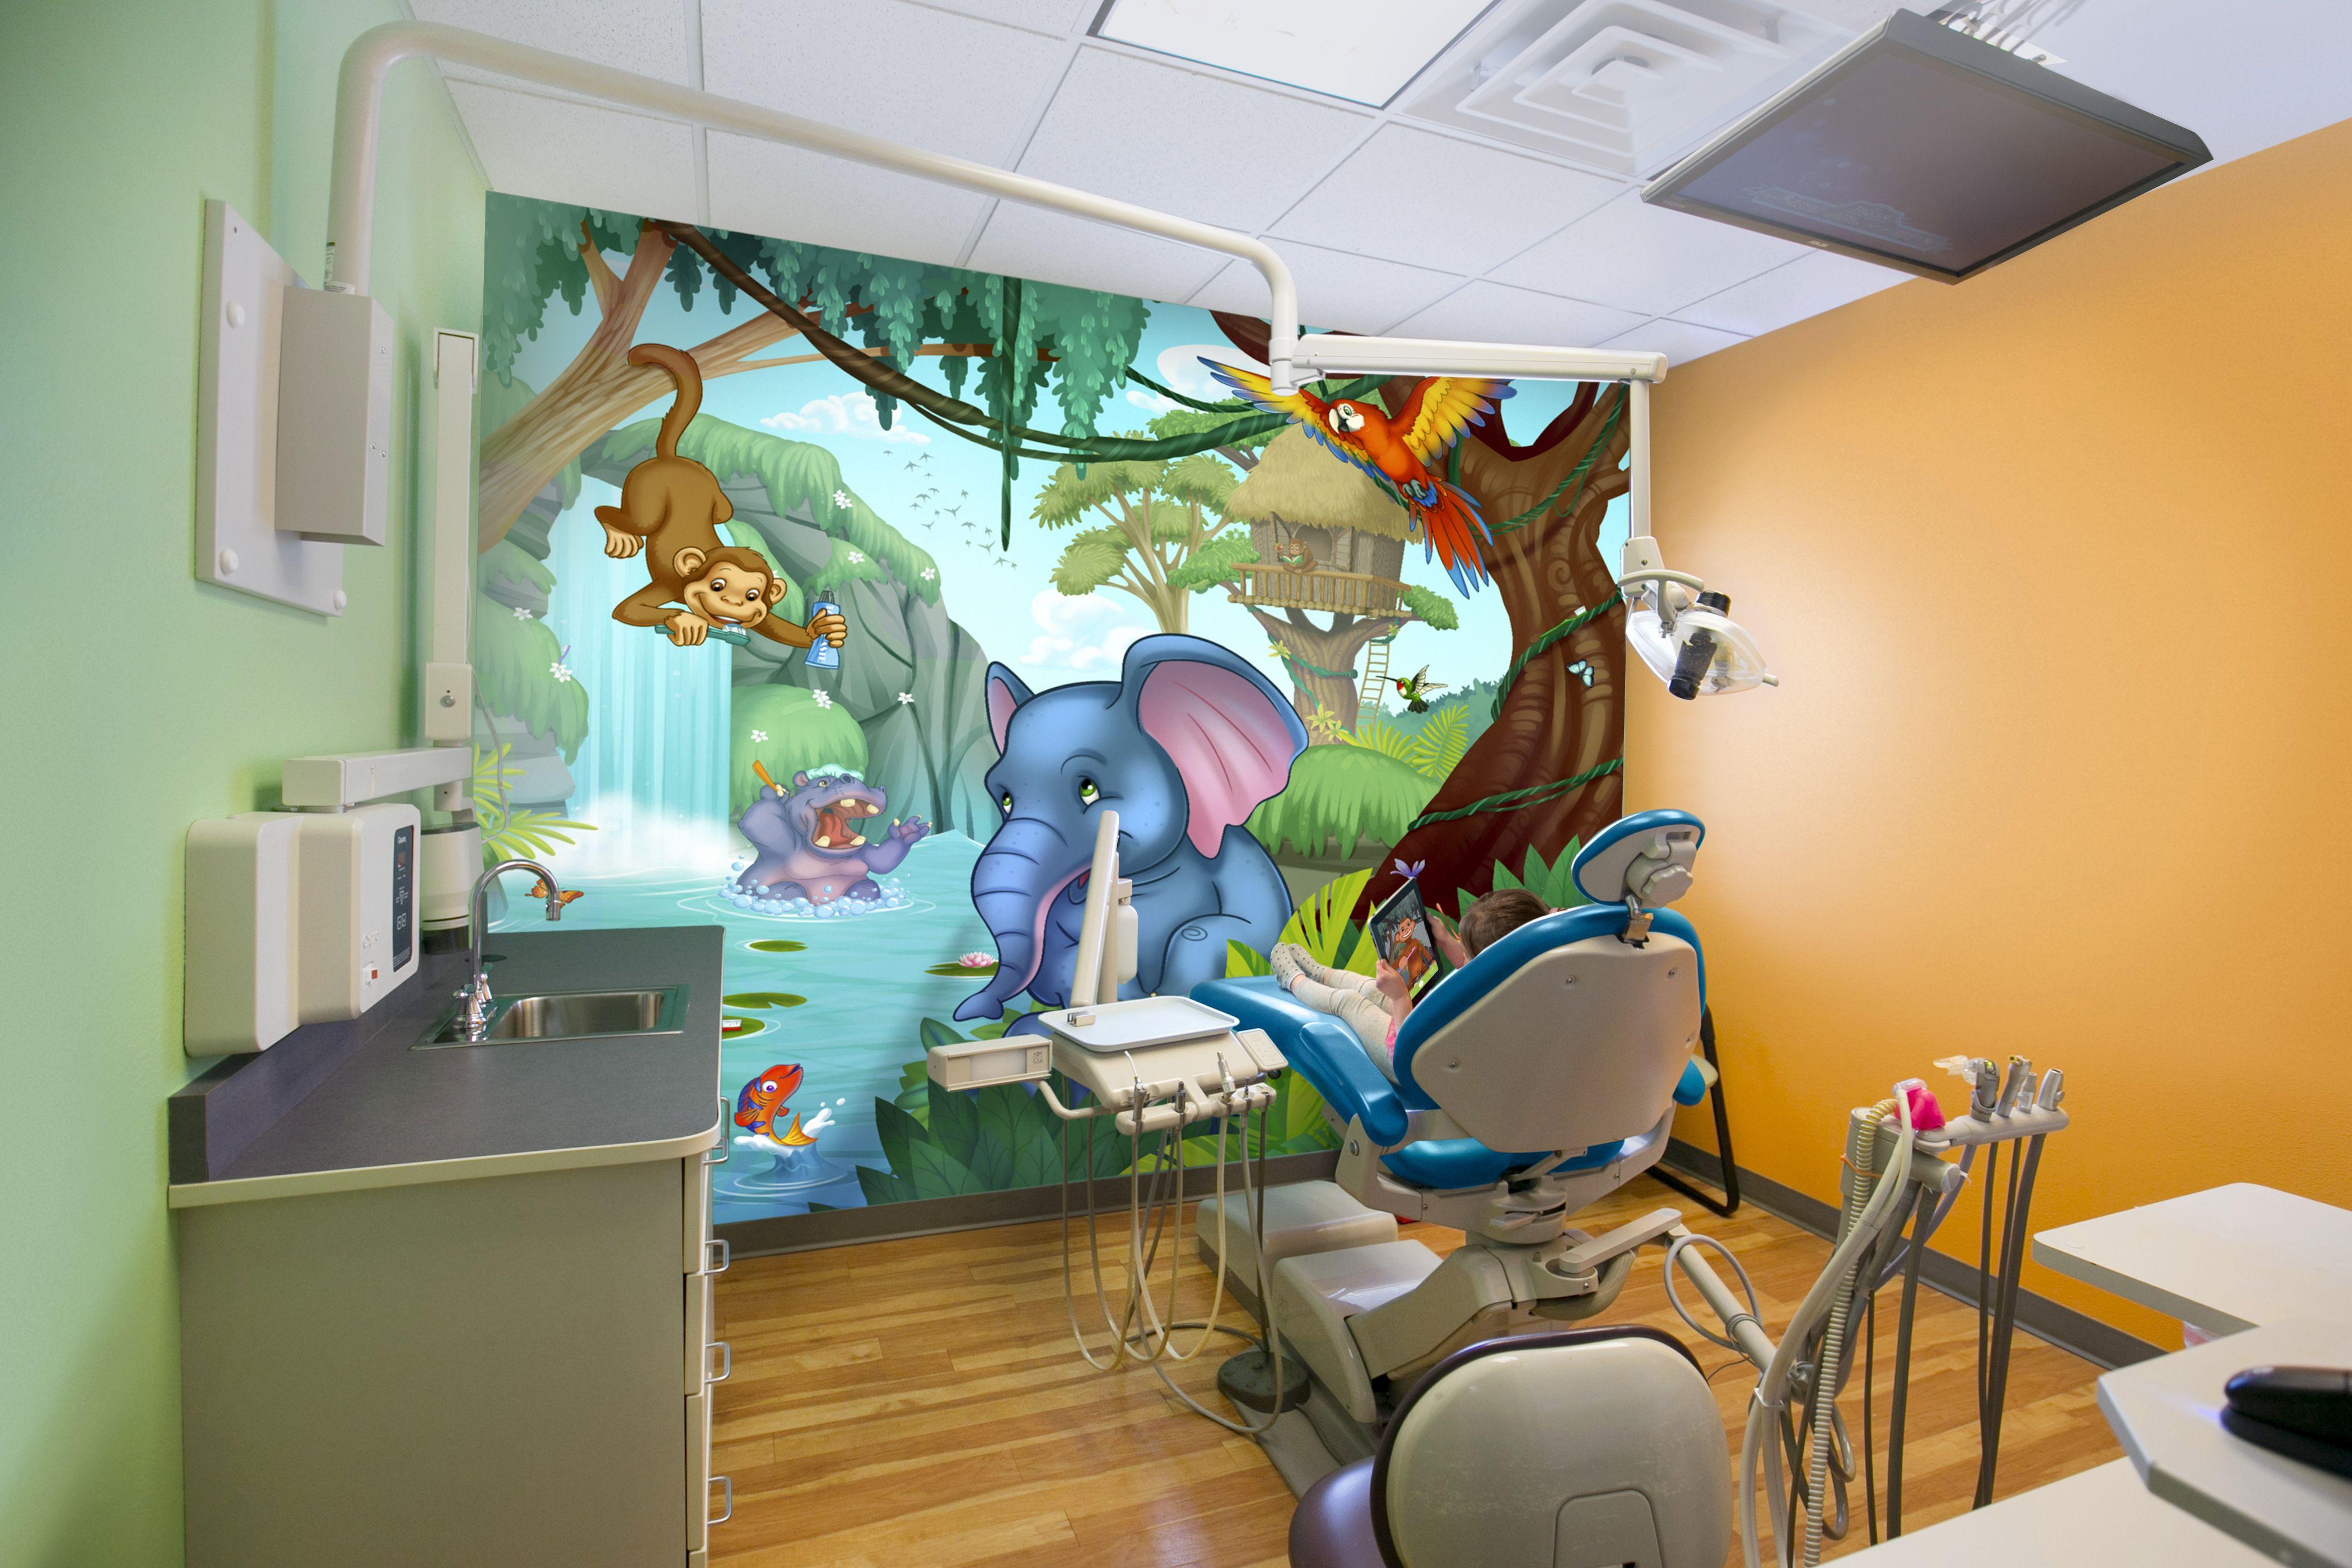 Themed Dentist Office Augmented Reality Vivarra Pediatric Medical Decor Murals